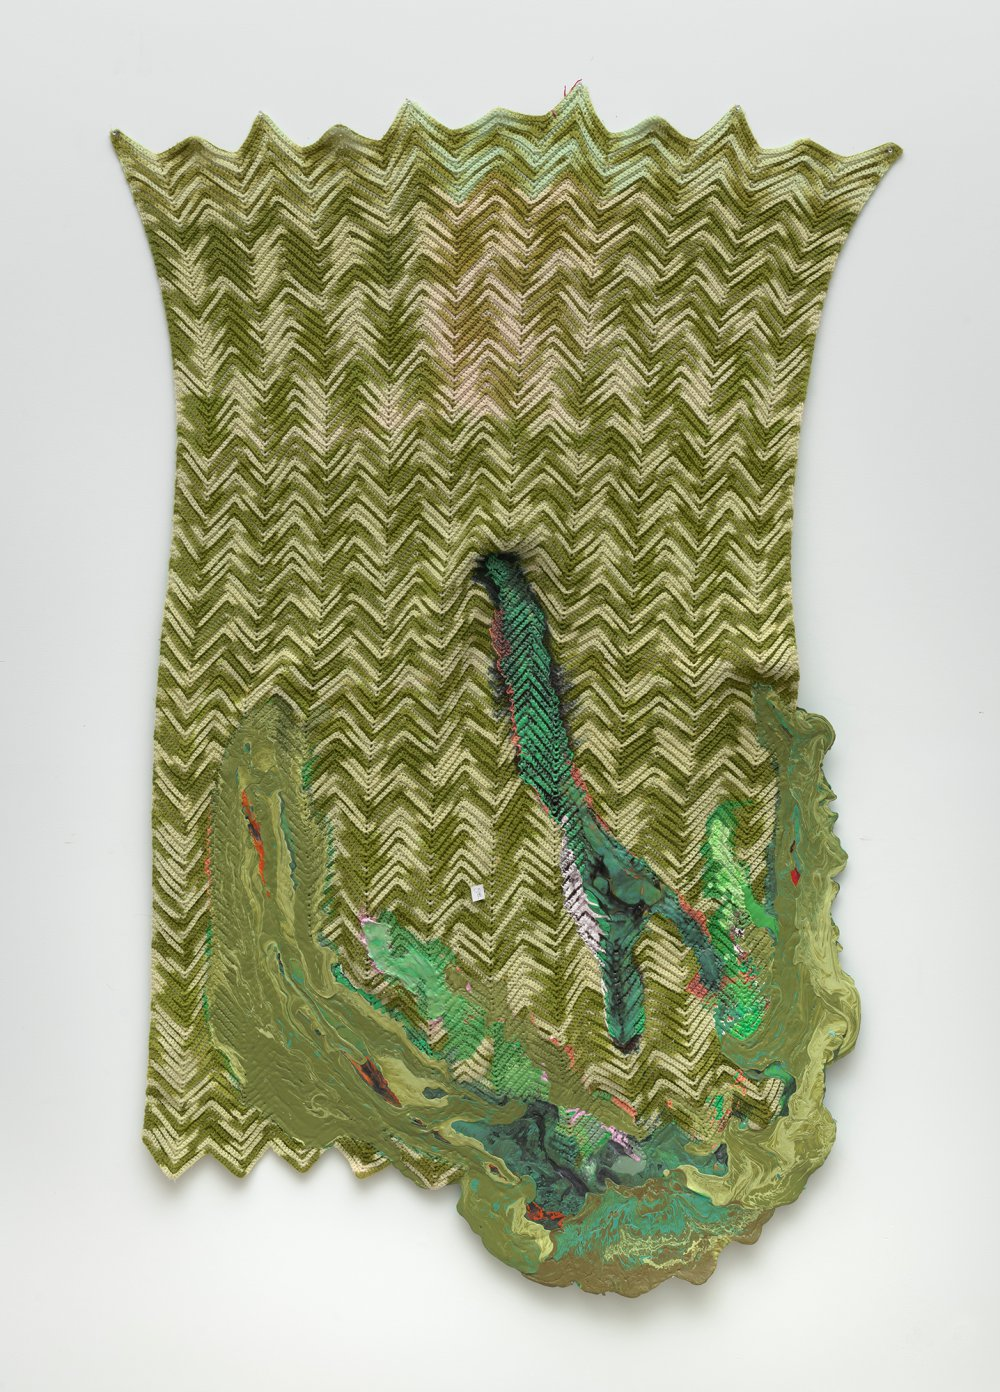 Untitled (green afghan)